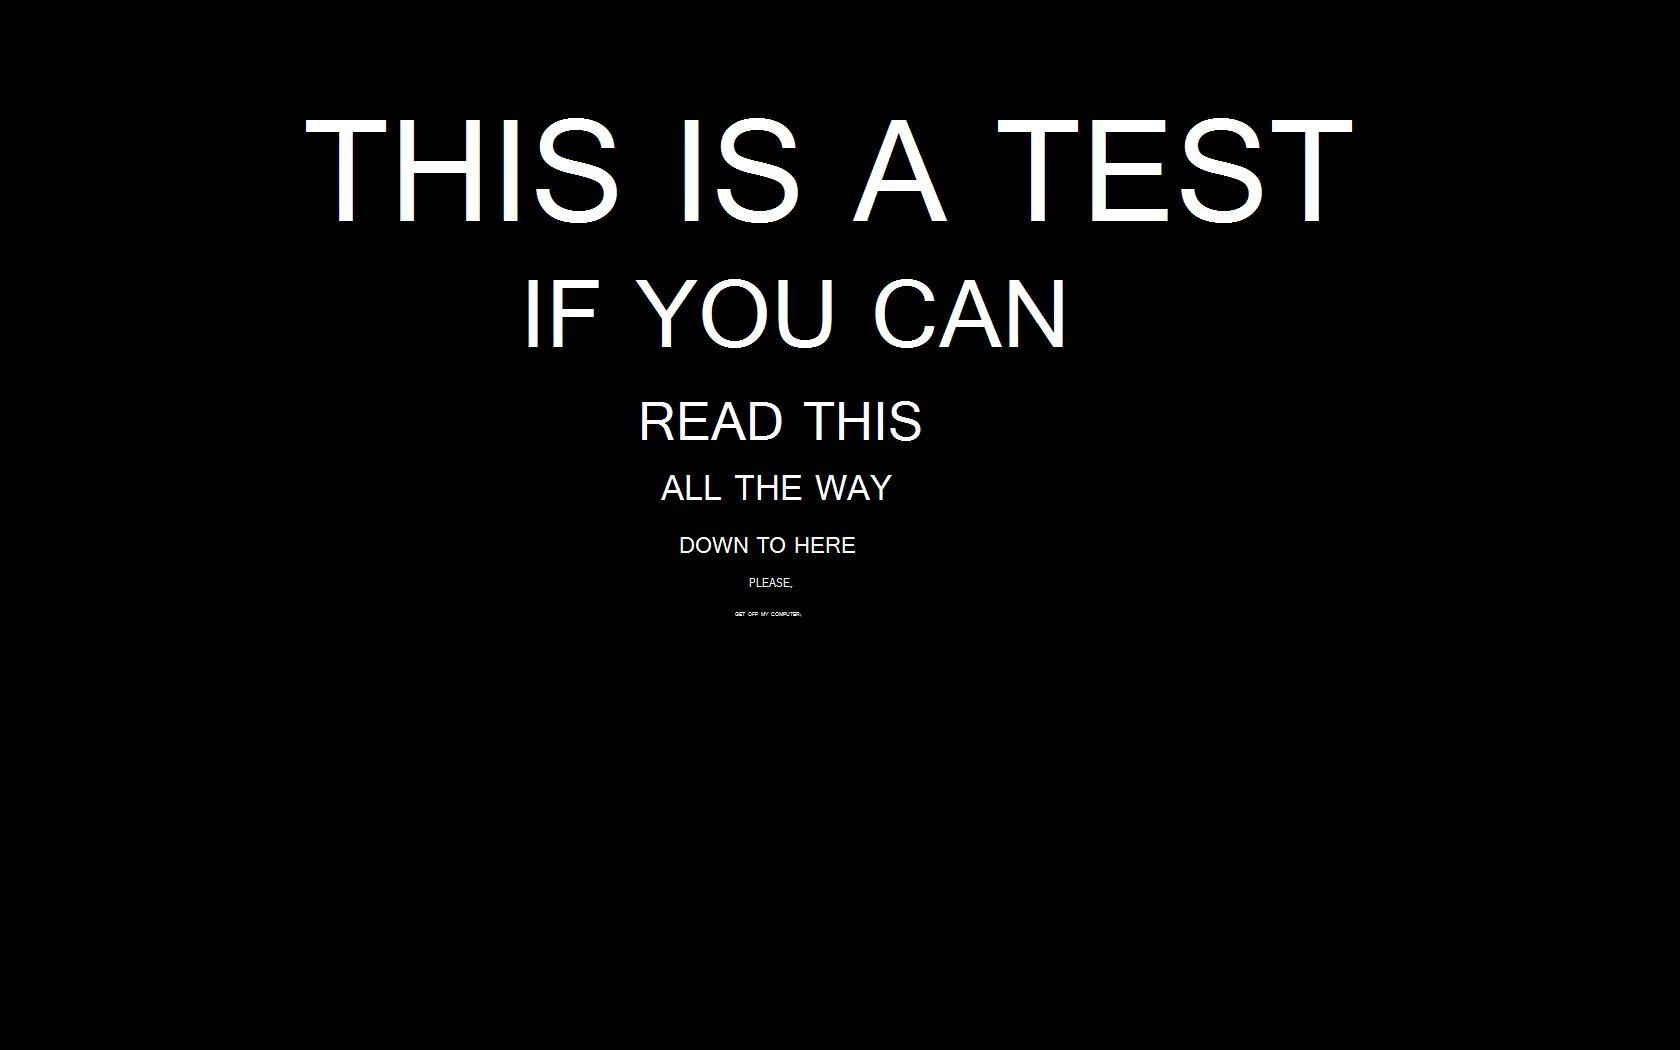 General 1680x1050 typography minimalism digital art black background humor